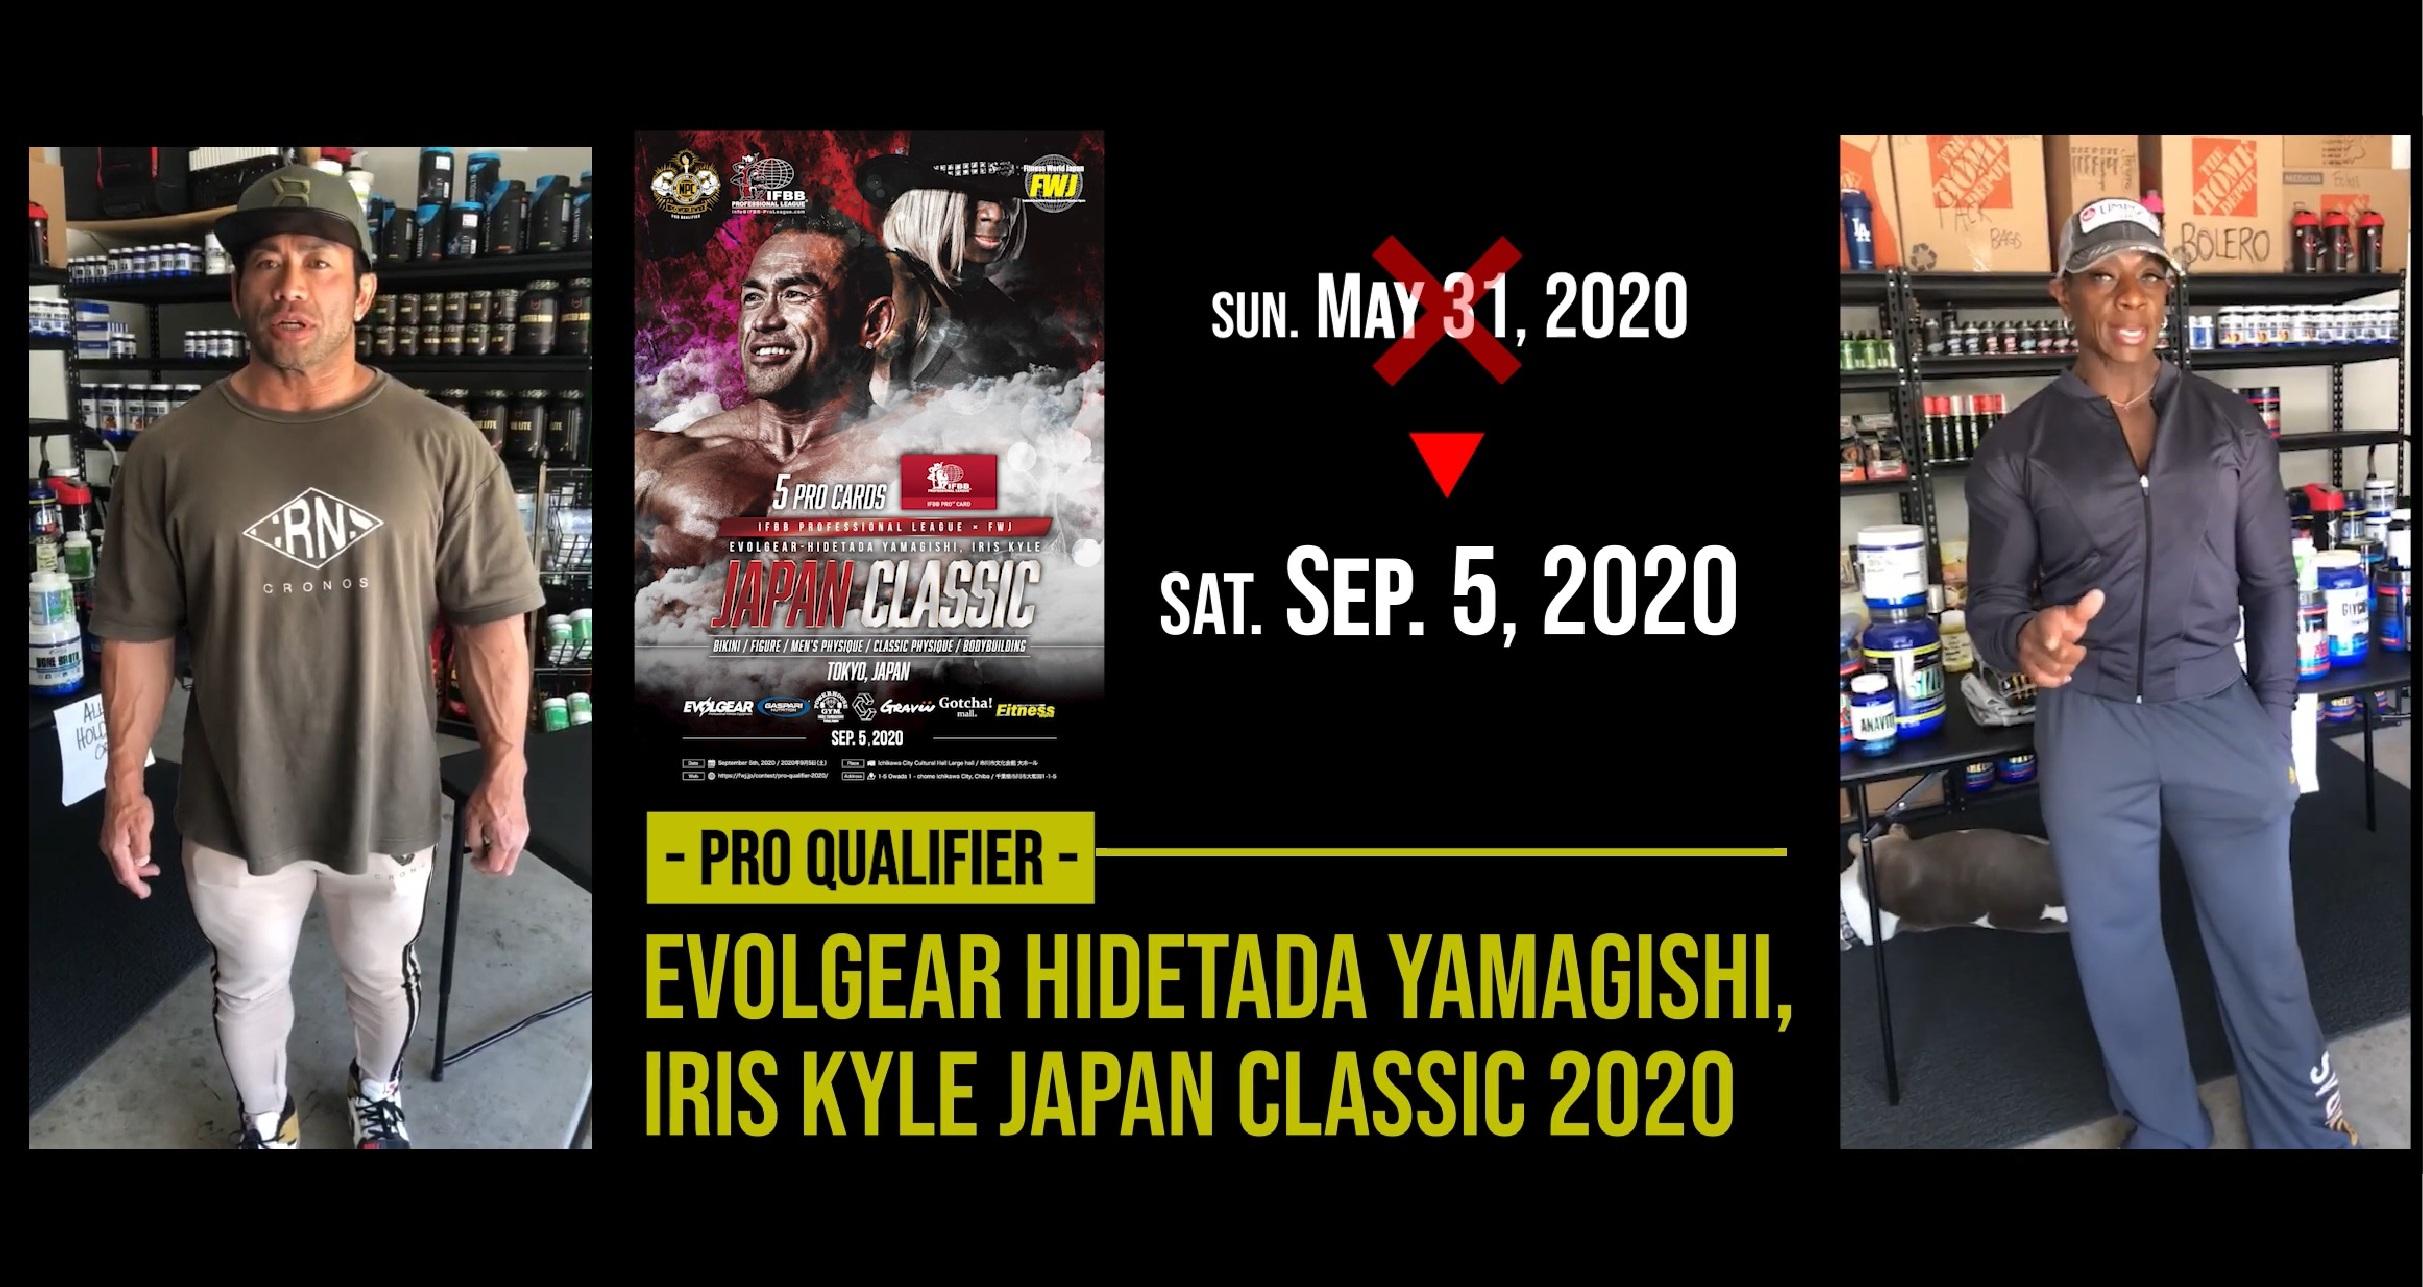 EVOLGEAR Hidetada Yamagishi, Iris Kyle Japan Classic 2020 開催日程に関して